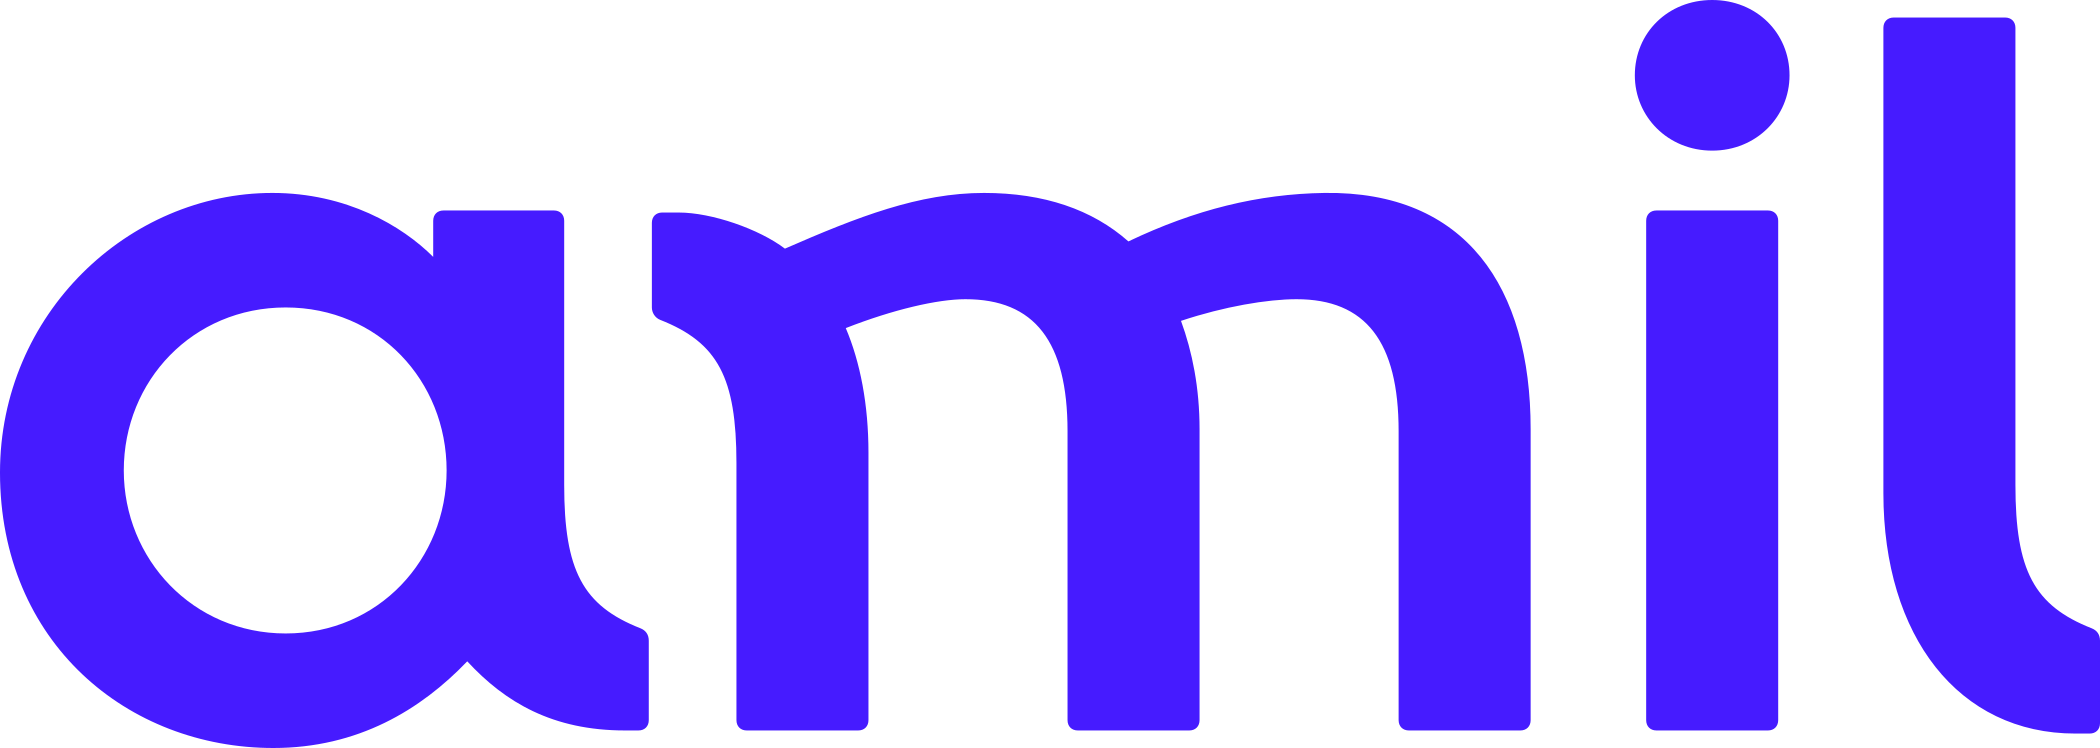 amil logo 2 1 - Amil Logo